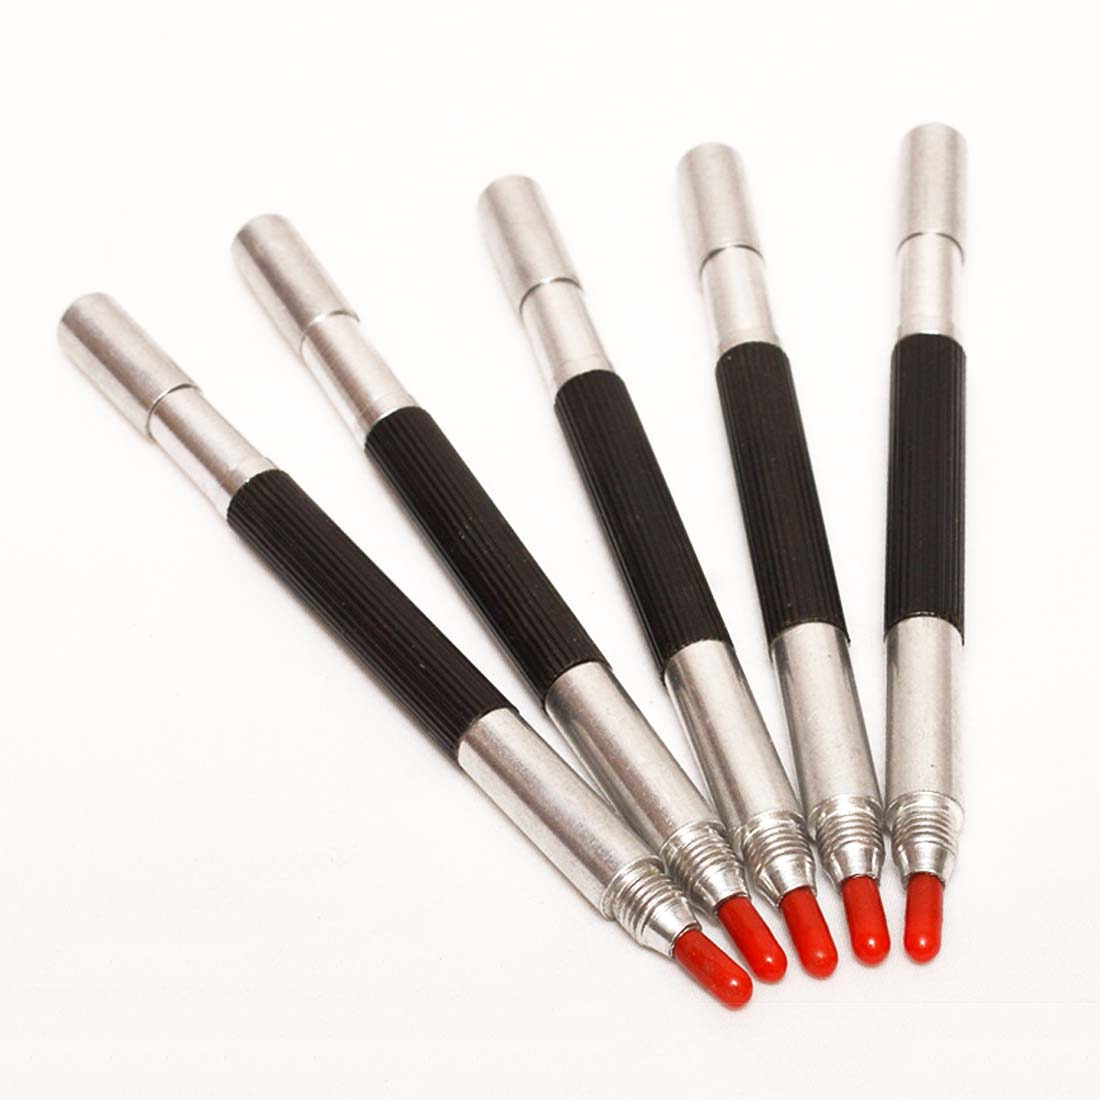 Double Head Glass Tile Cutter Pen 130mm Carbide Scriber Hard Metal Tile Cutting Machine Lettering Pen Glass Knife